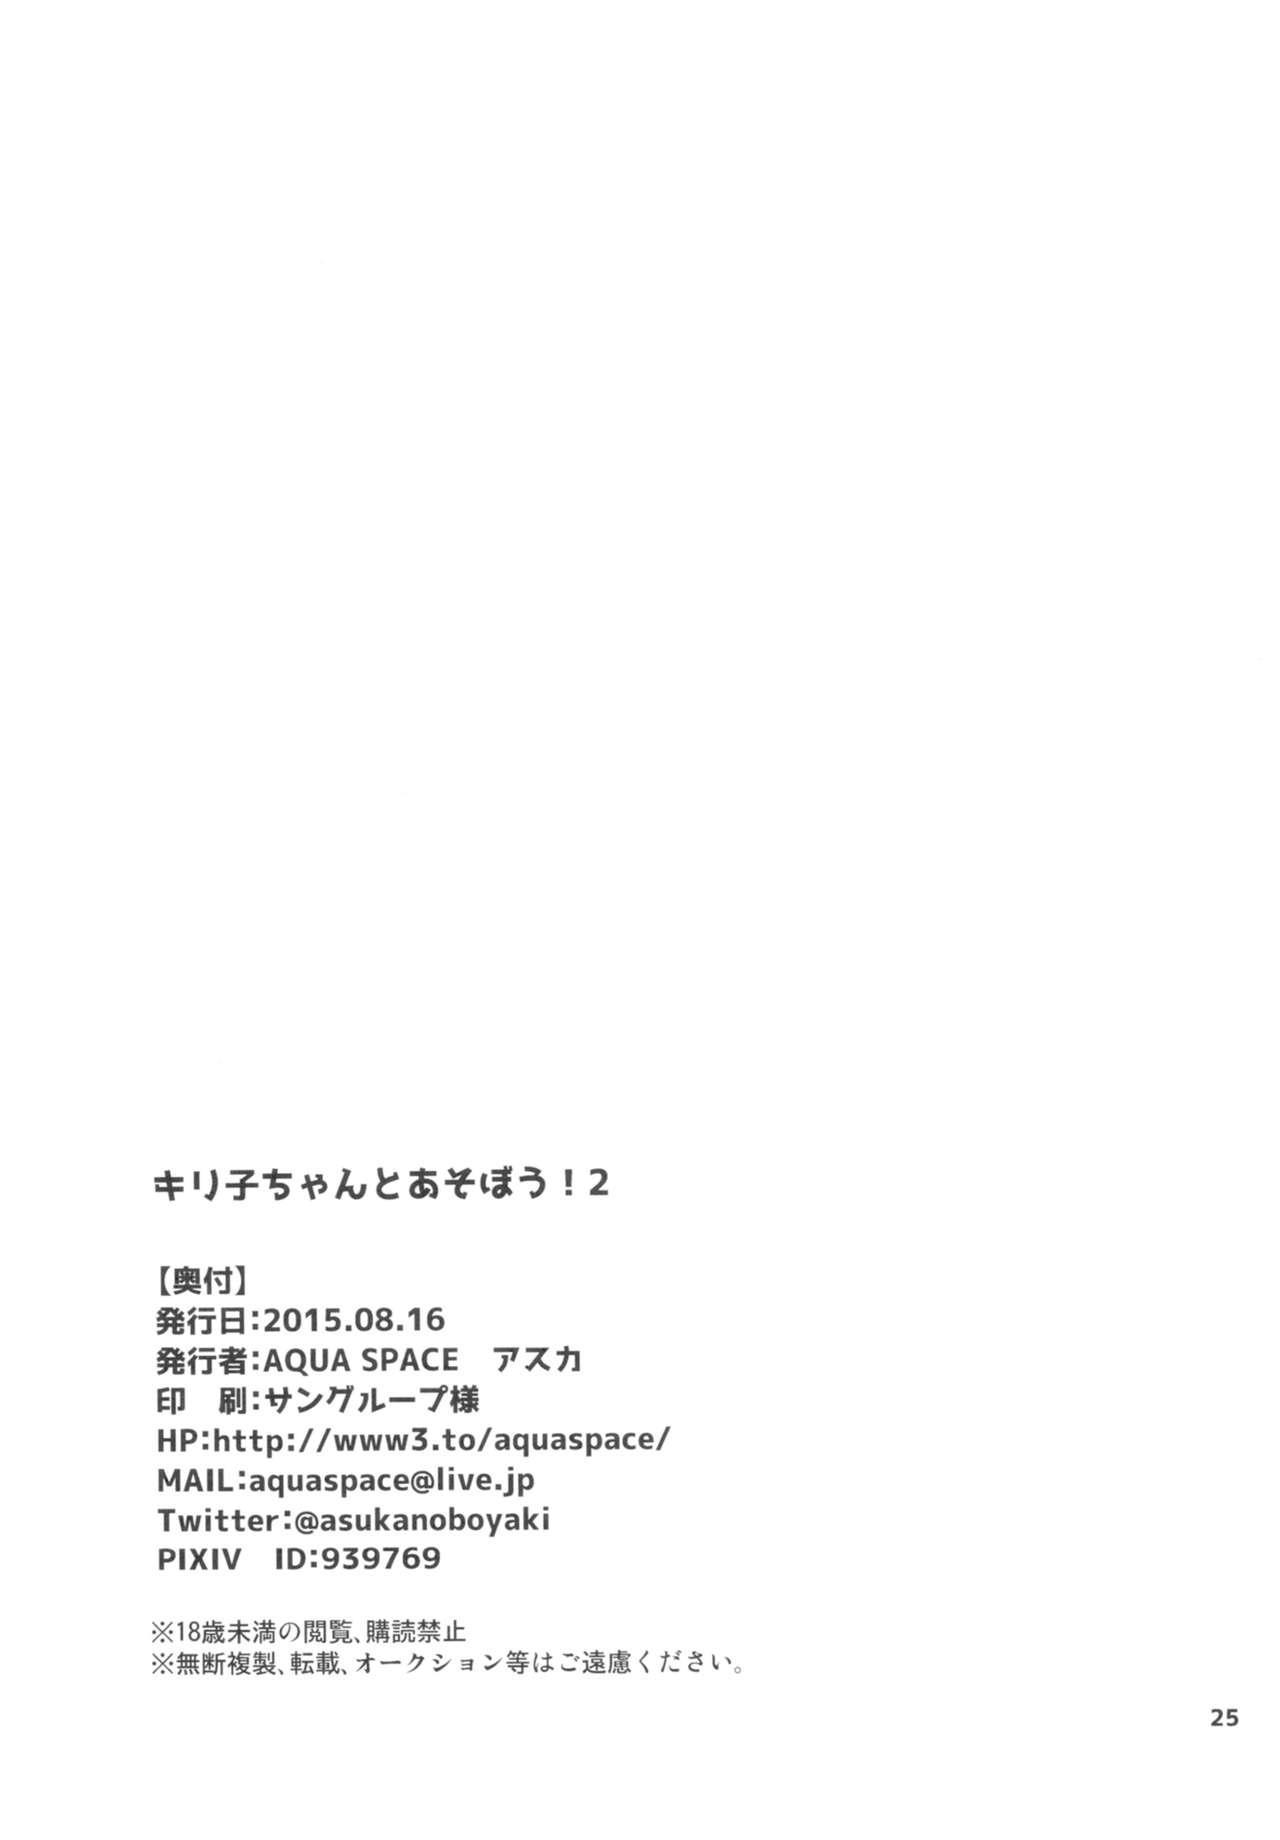 (C88) [AQUA SPACE (Asuka)] Kiriko-chan to Asobou! 2   Let's play with Kiriko-chan! 2 (Sword Art Online) [English] [EHCOVE] 23